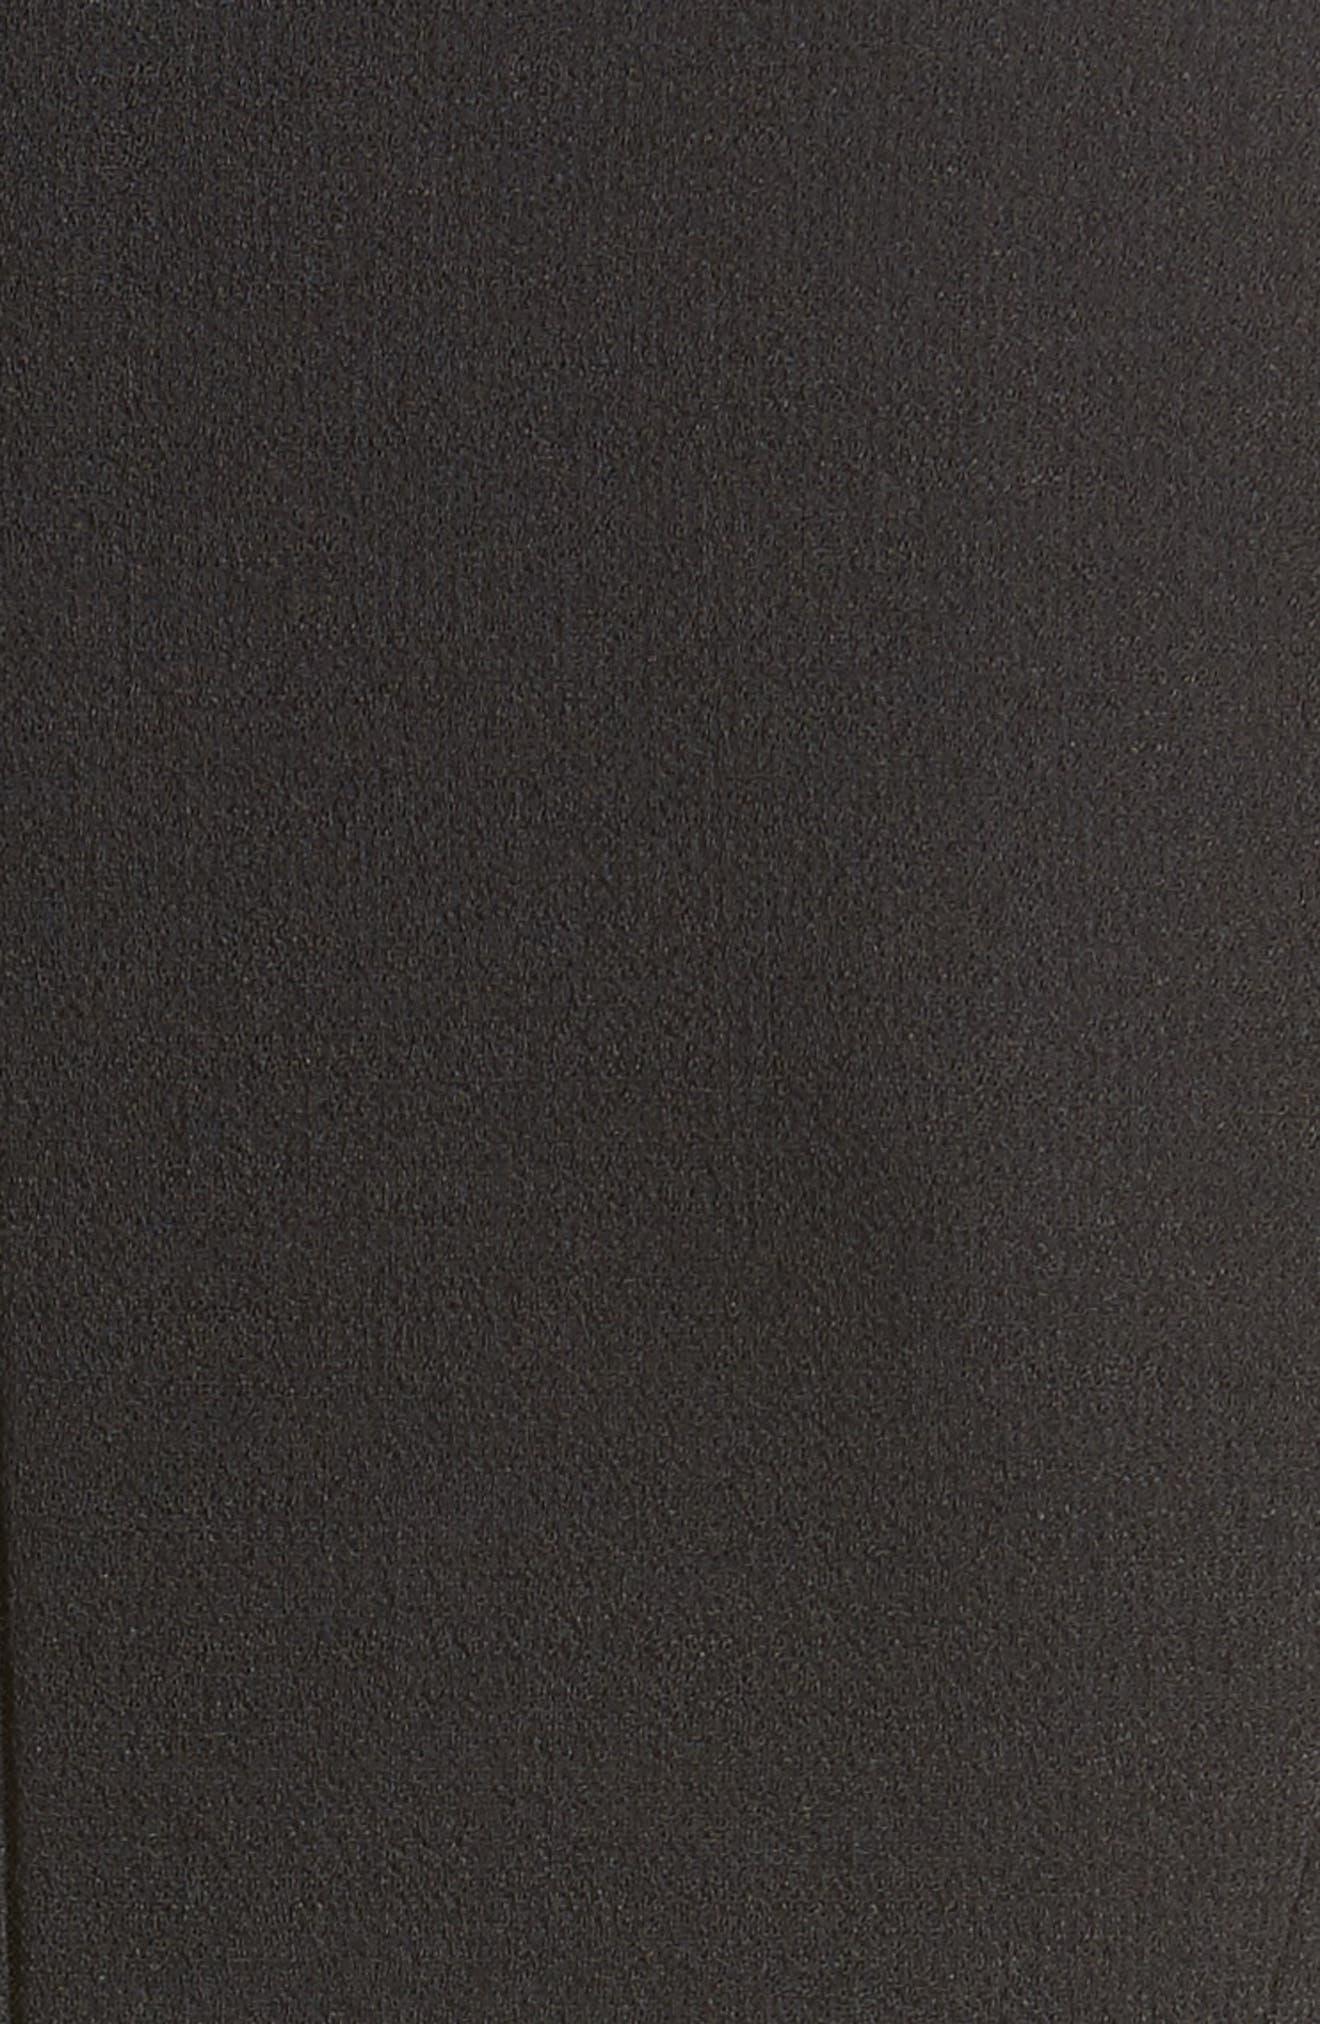 Belted Stretch Bouclé Crepe Sheath Dress,                             Alternate thumbnail 3, color,                             Black